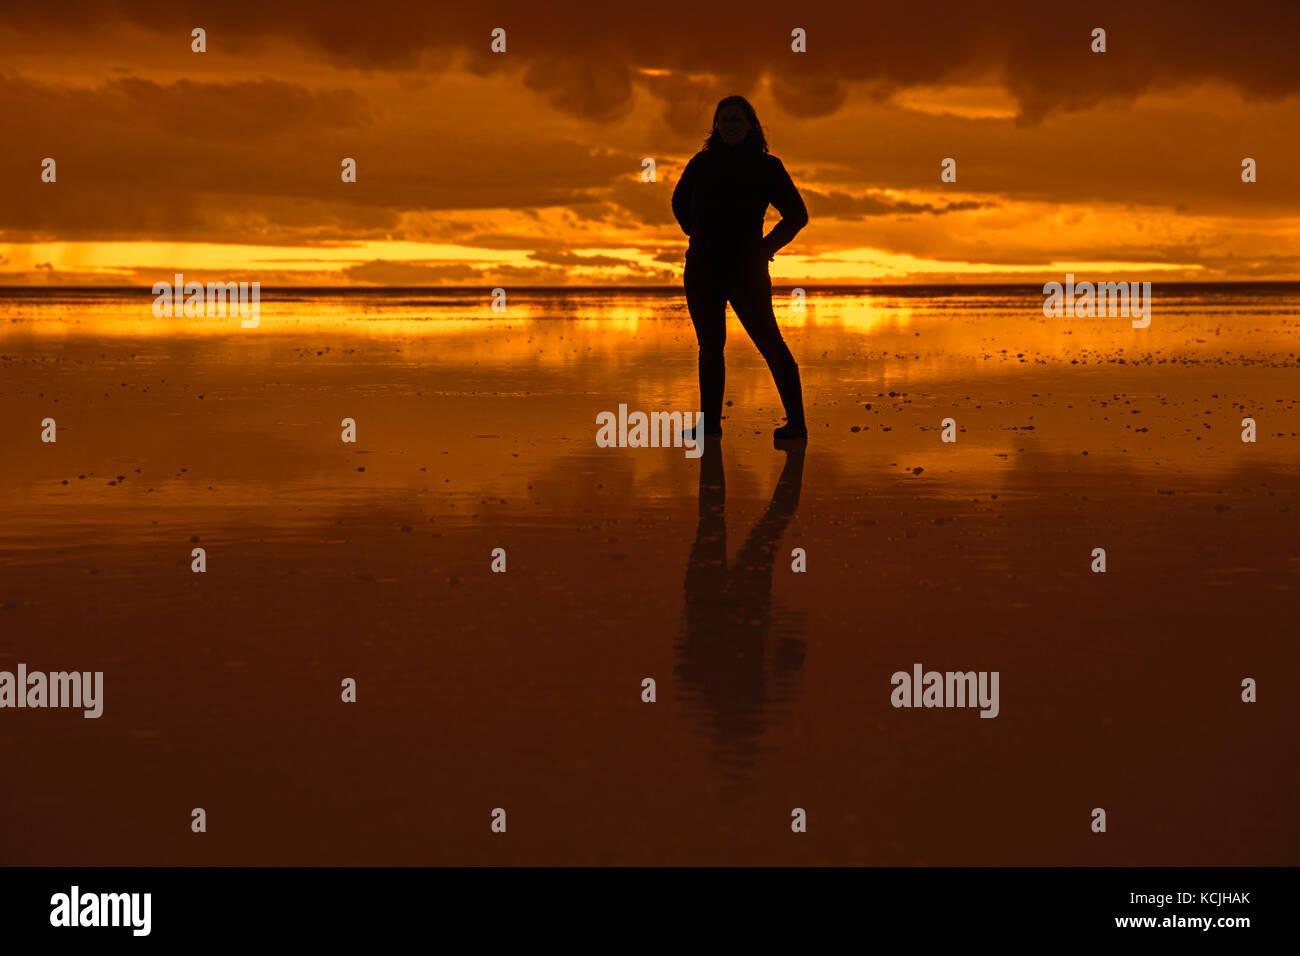 Silhouette of tourist posing on the Salar de Uyuni / Salar de Tunupa at sunset, world's largest salt flat, Daniel - Stock Image